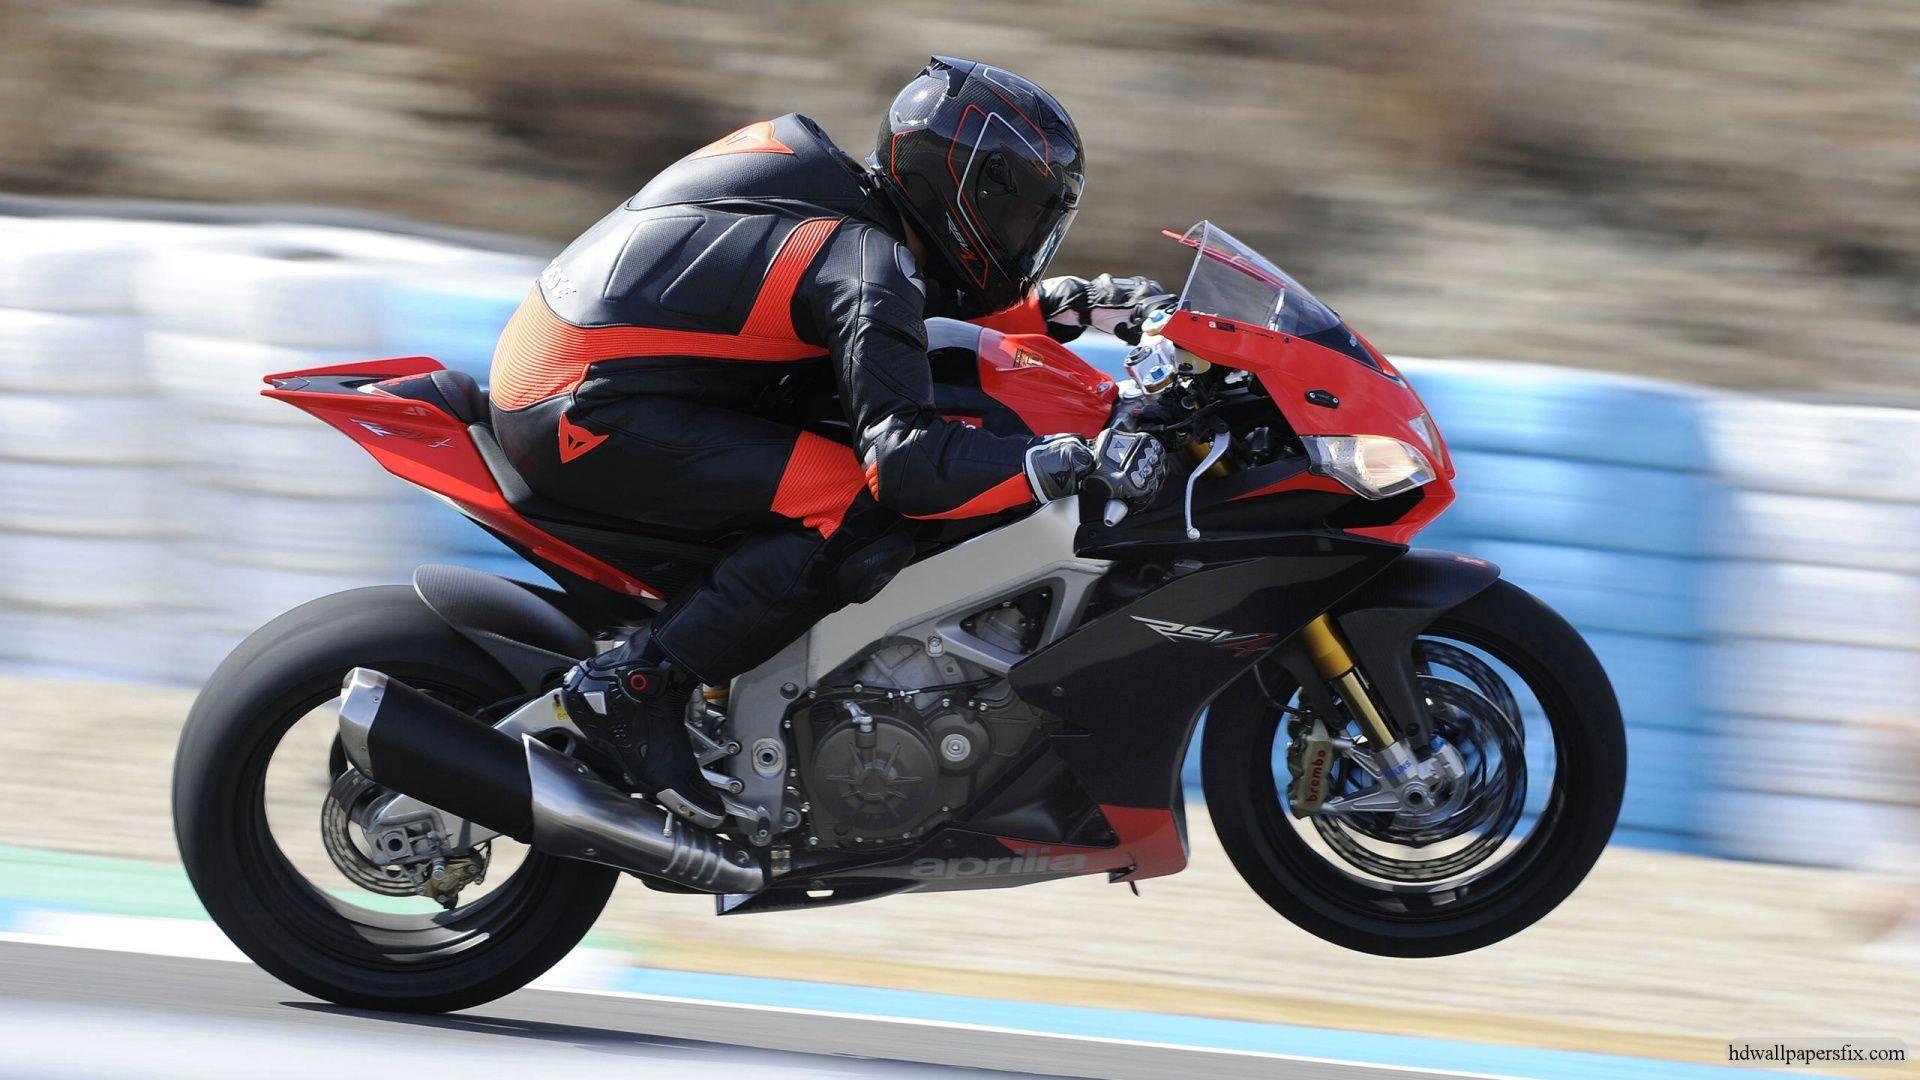 Aprilia RSV4 Bike HD Images Motorcycle wallpaper